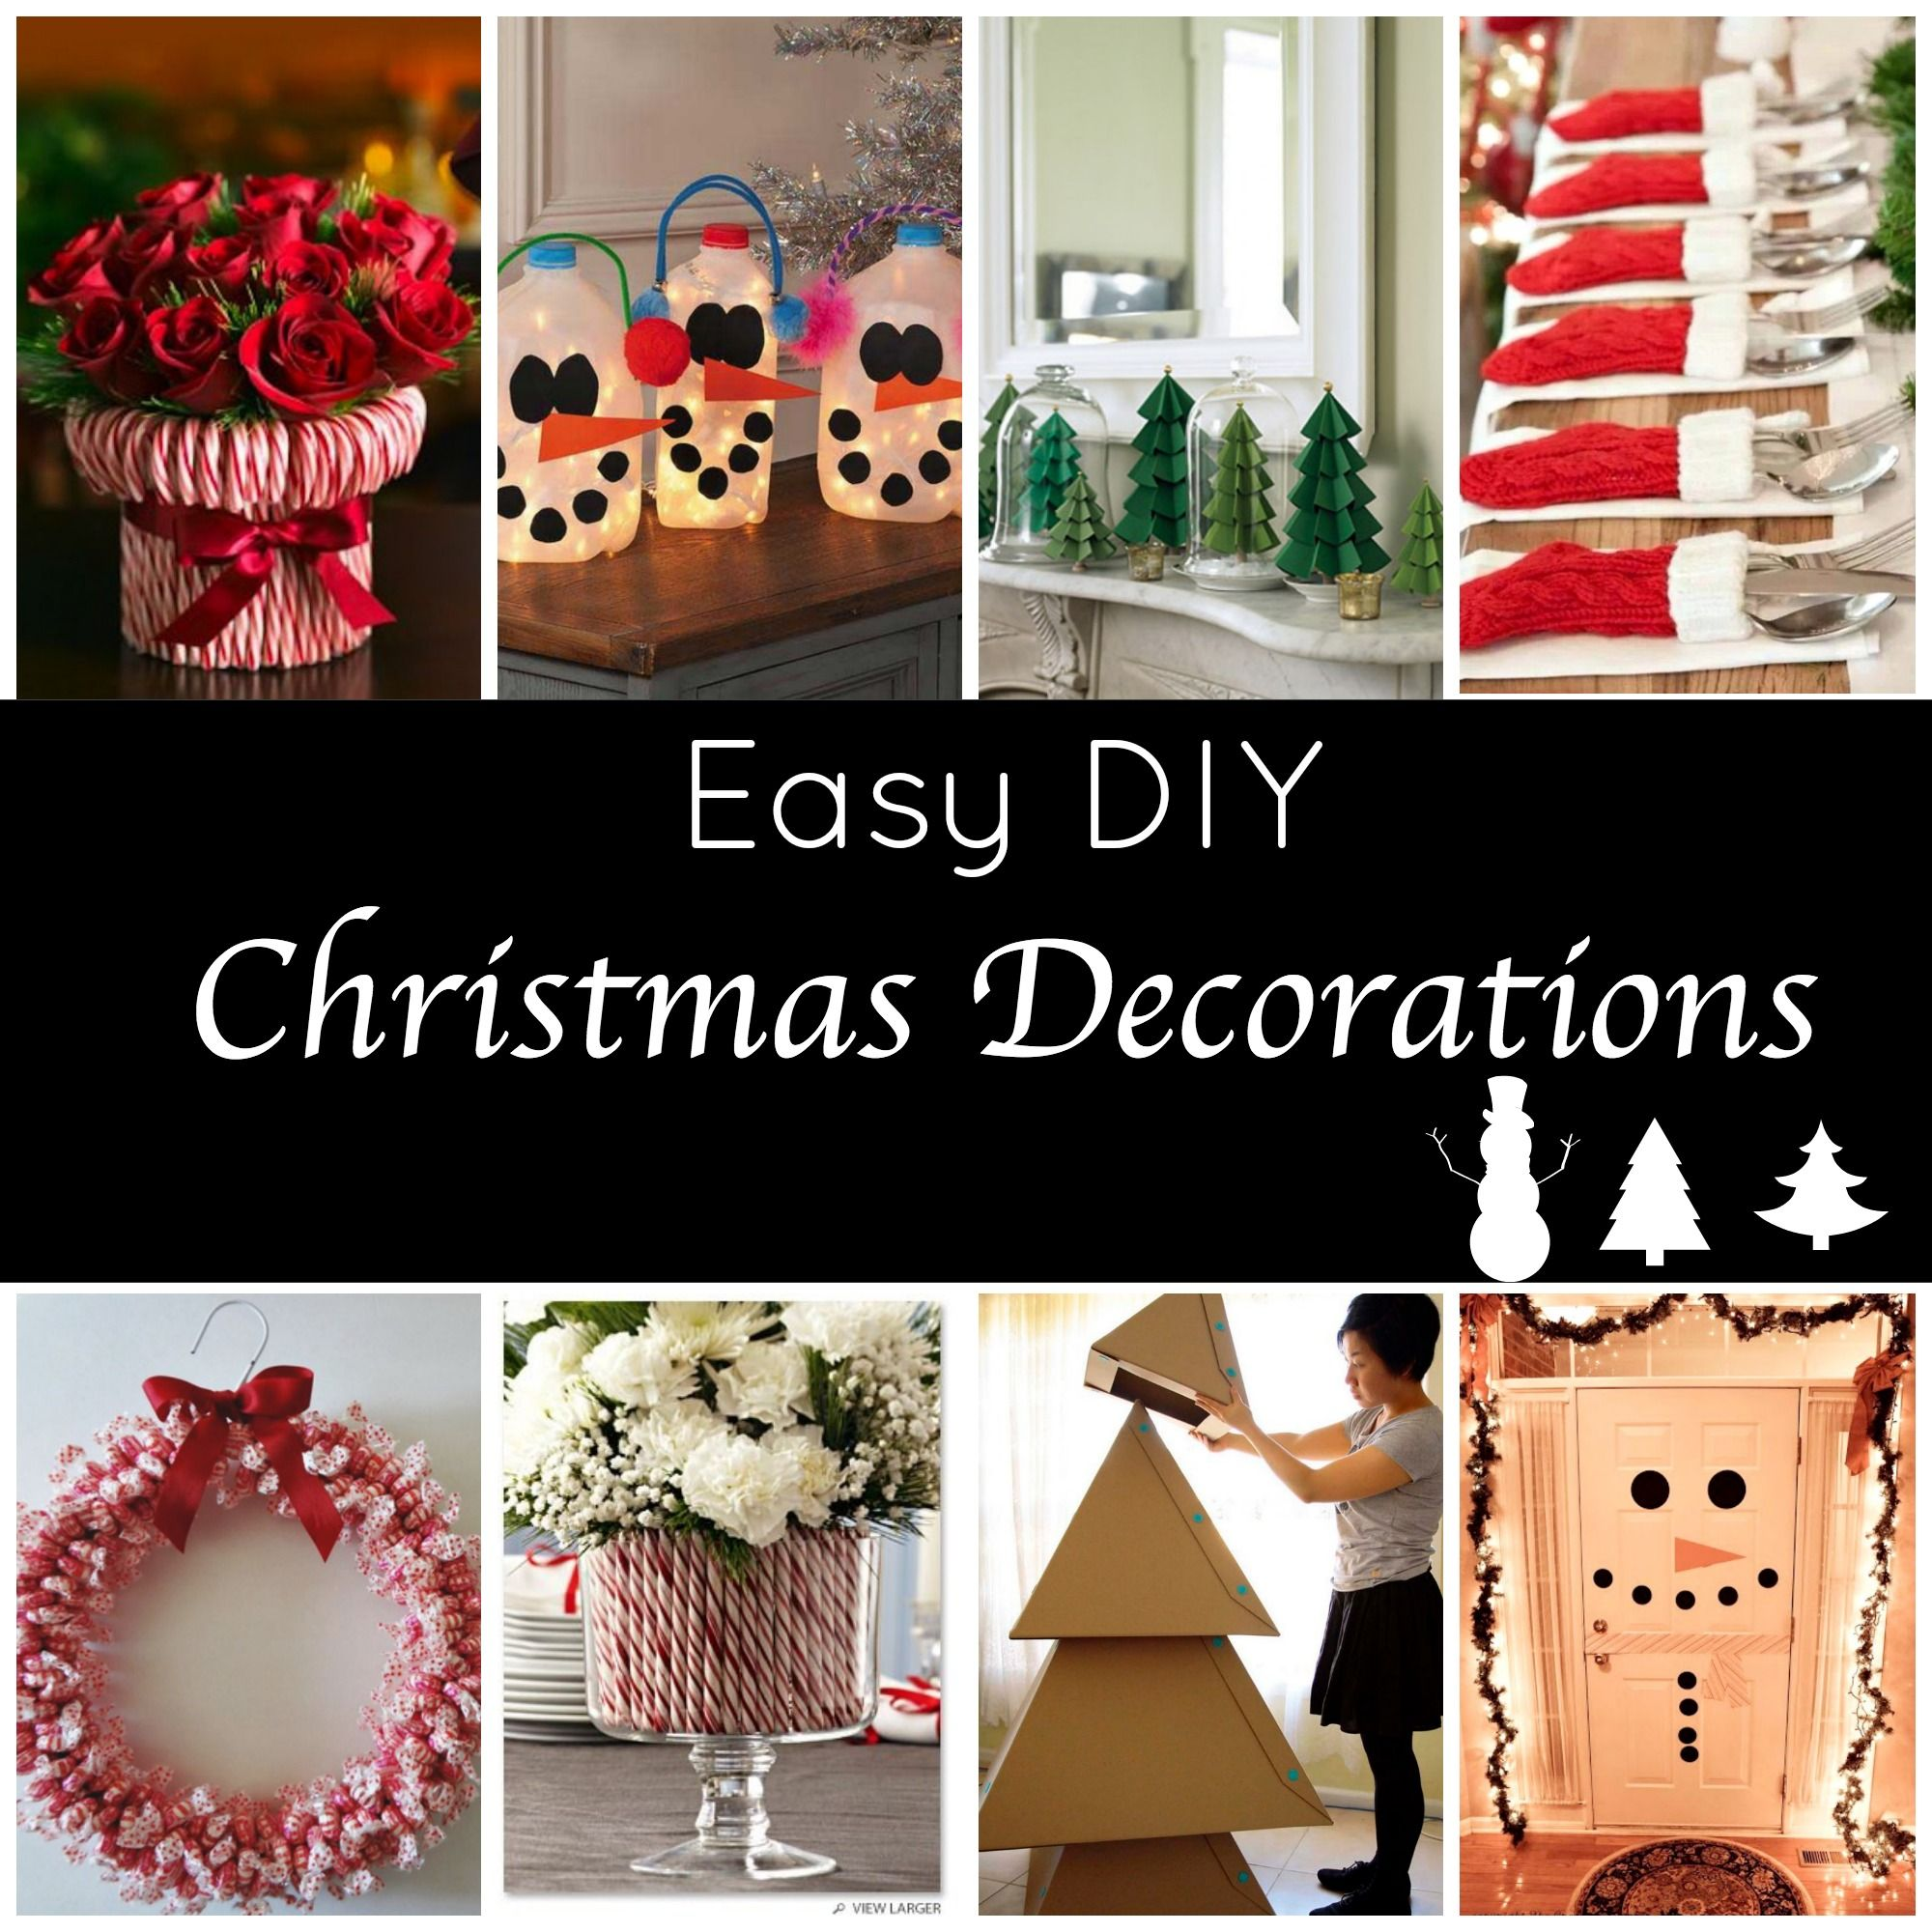 DIY Christmas Decorations Diy christmas decorations easy